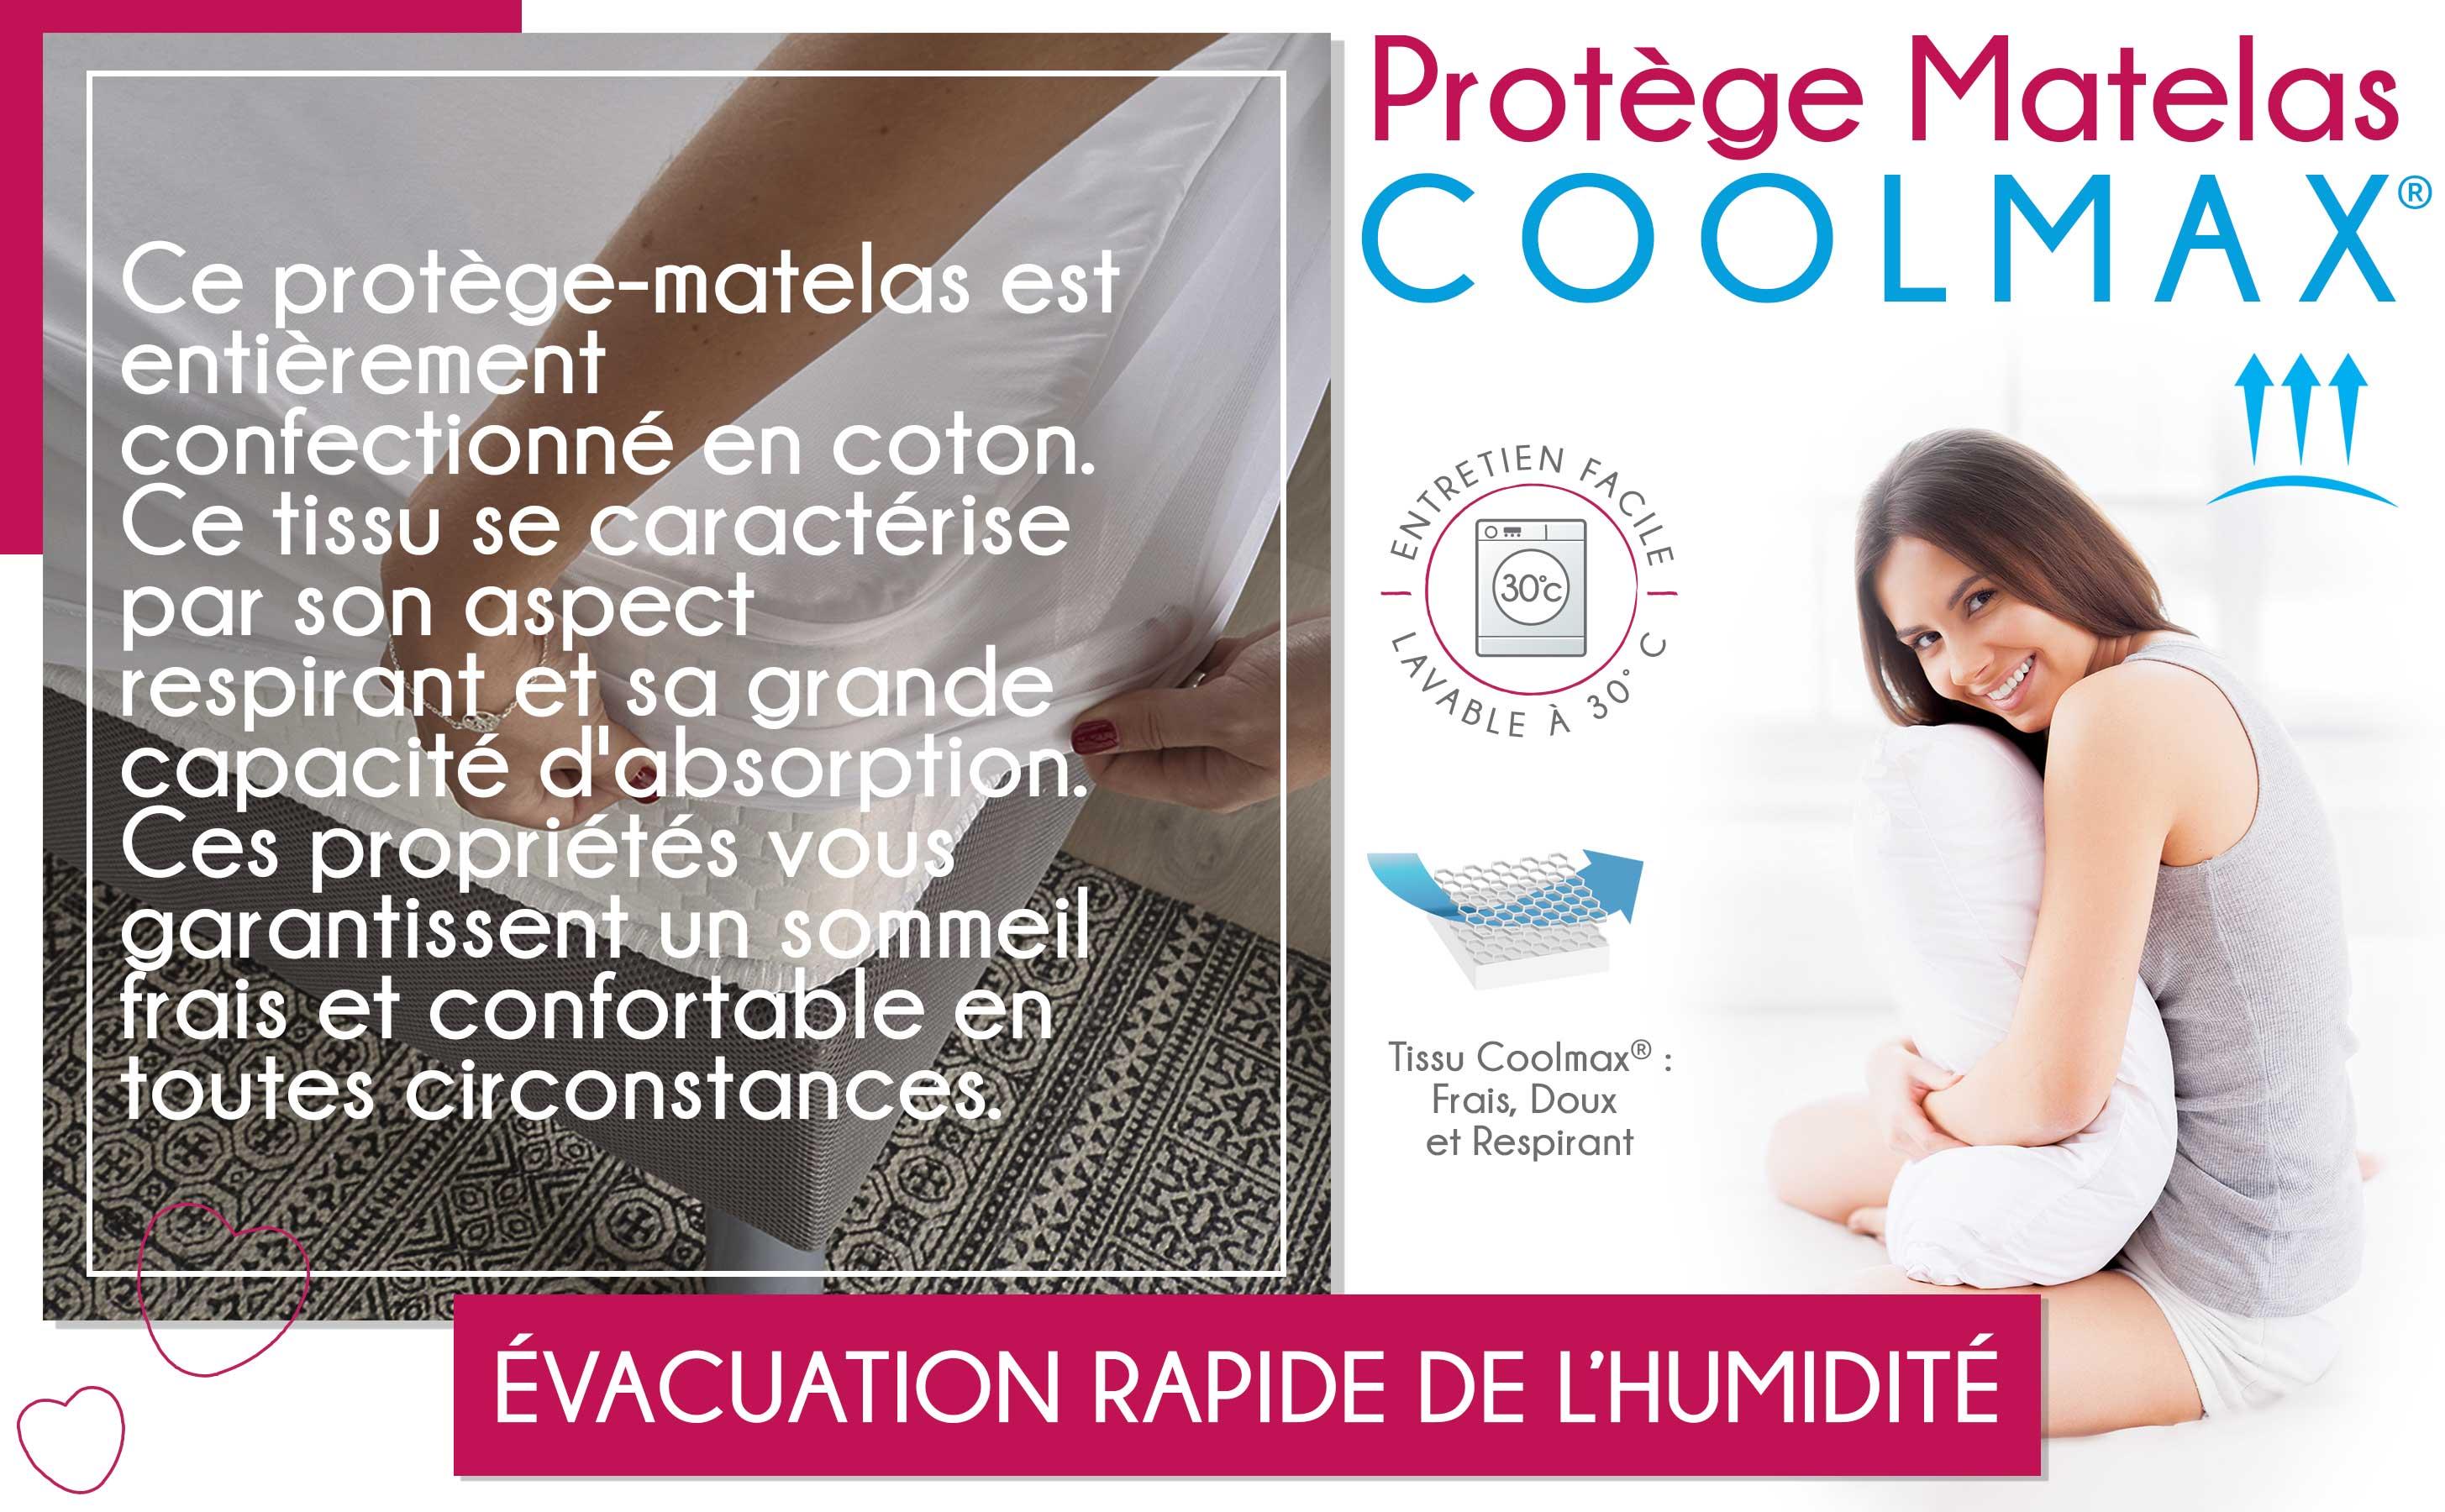 protège matelas thermorégulateur